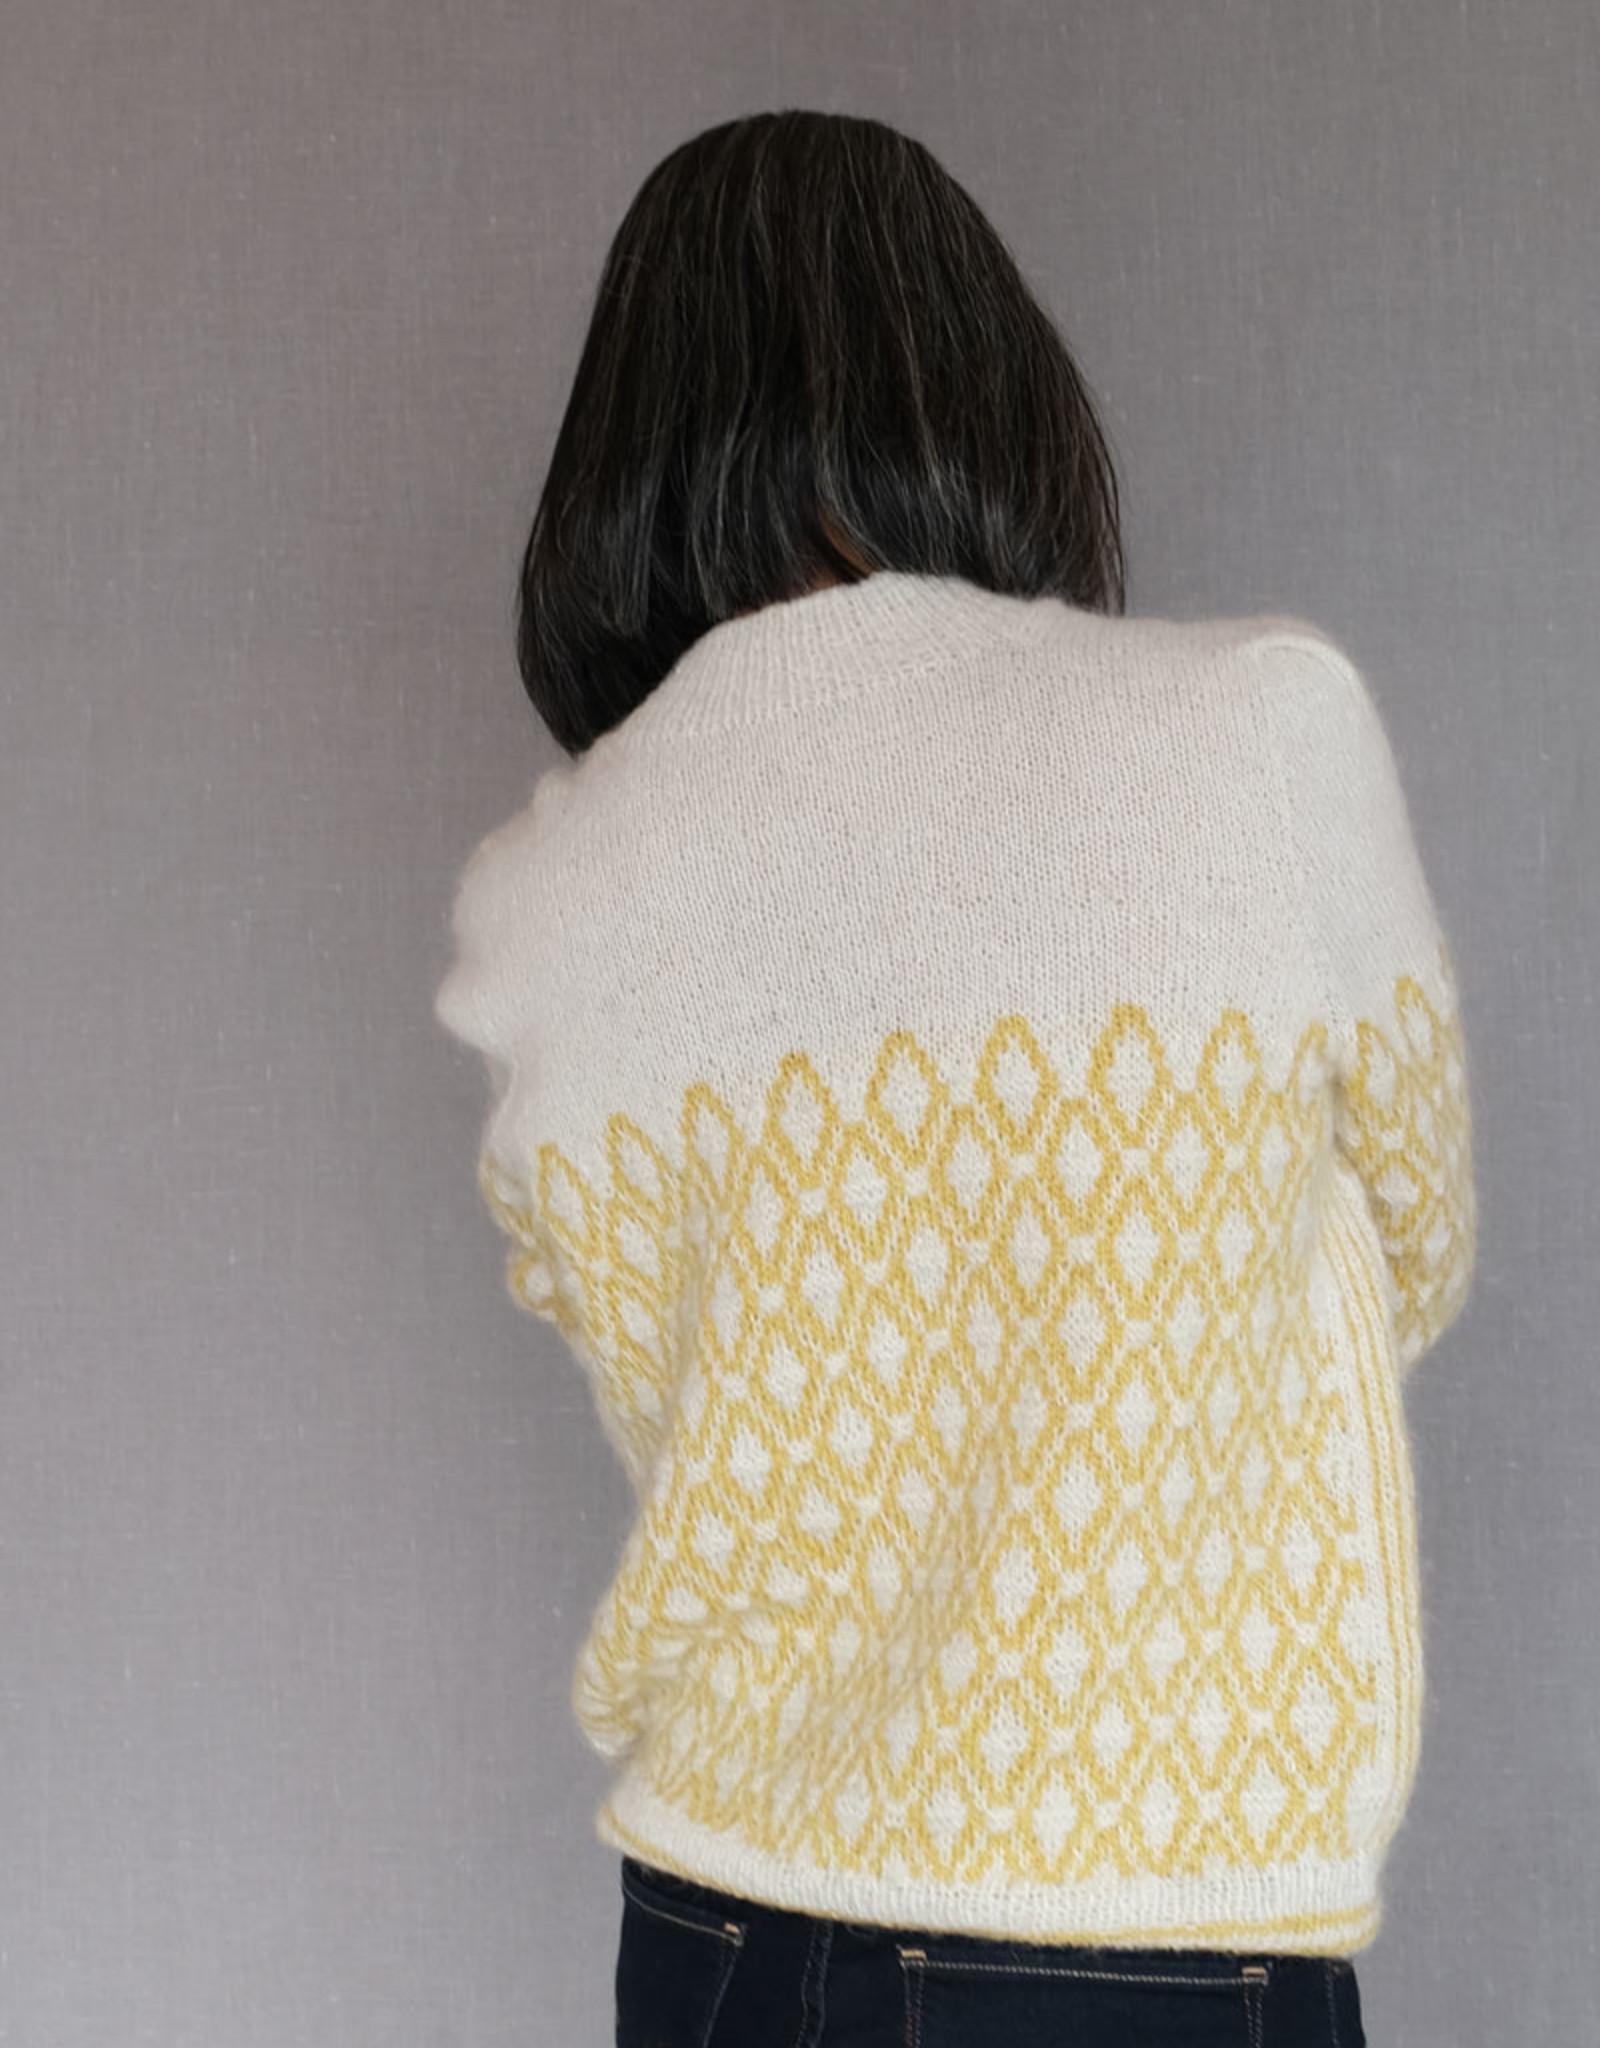 einrúm KAG02 Tivoli sweater